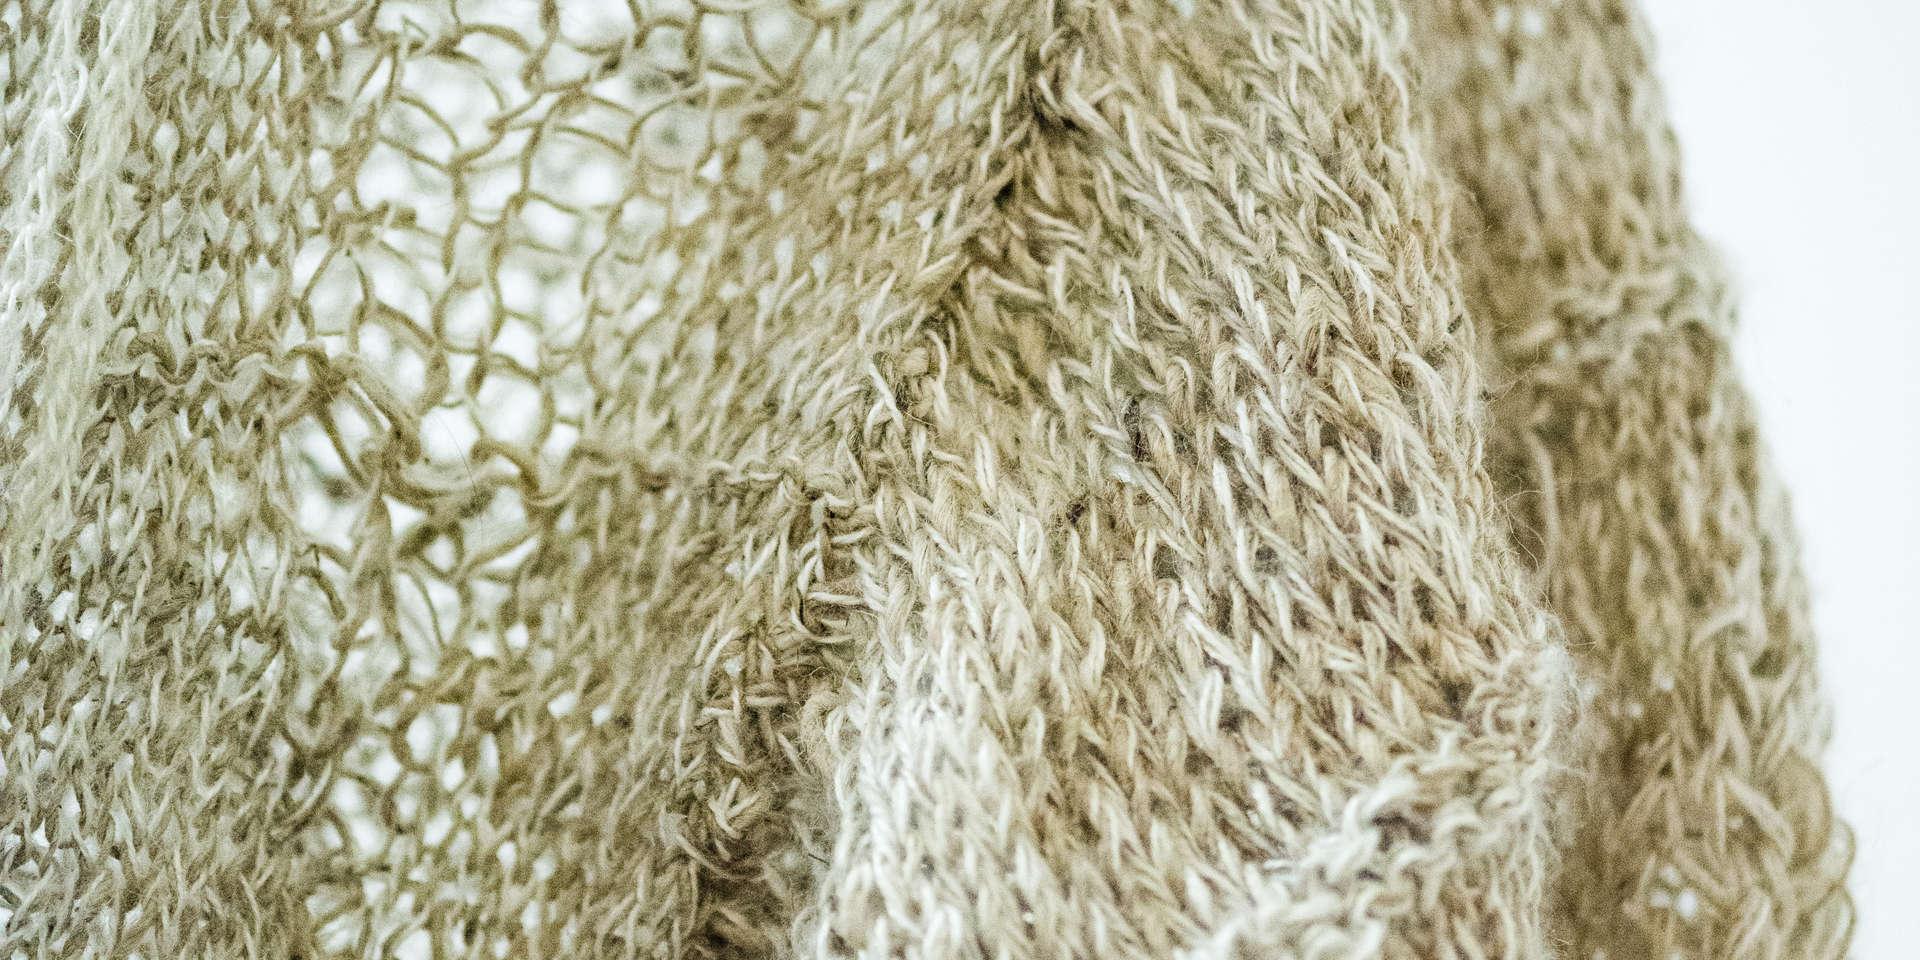 Wild Swans, Abridged (detail6); nettle silk, ramie; 240x159x166cm; photo A Thompson; Fiona Percy 2018